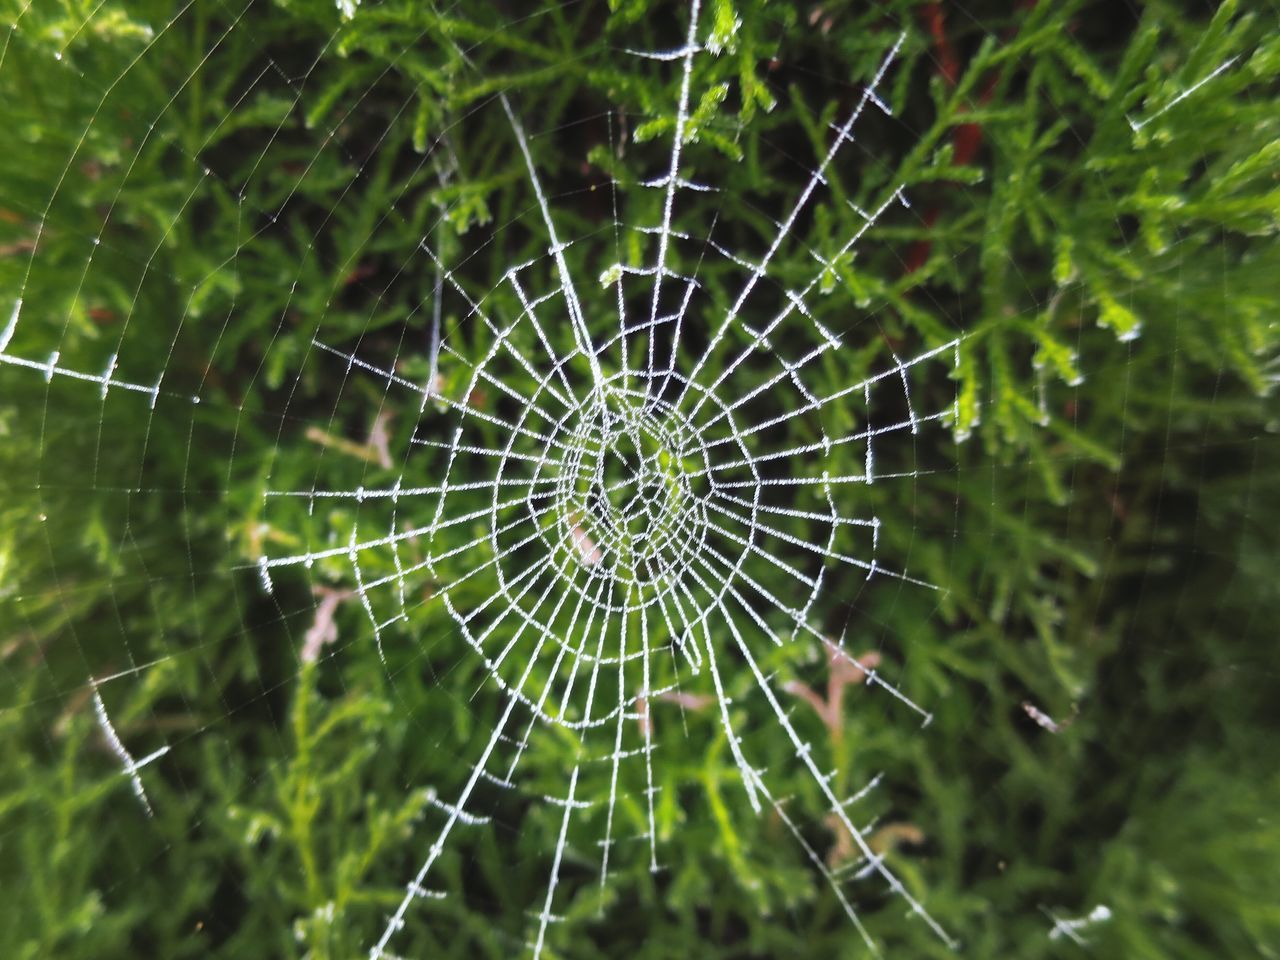 SPIDER ON WEB AGAINST BLURRED BACKGROUND